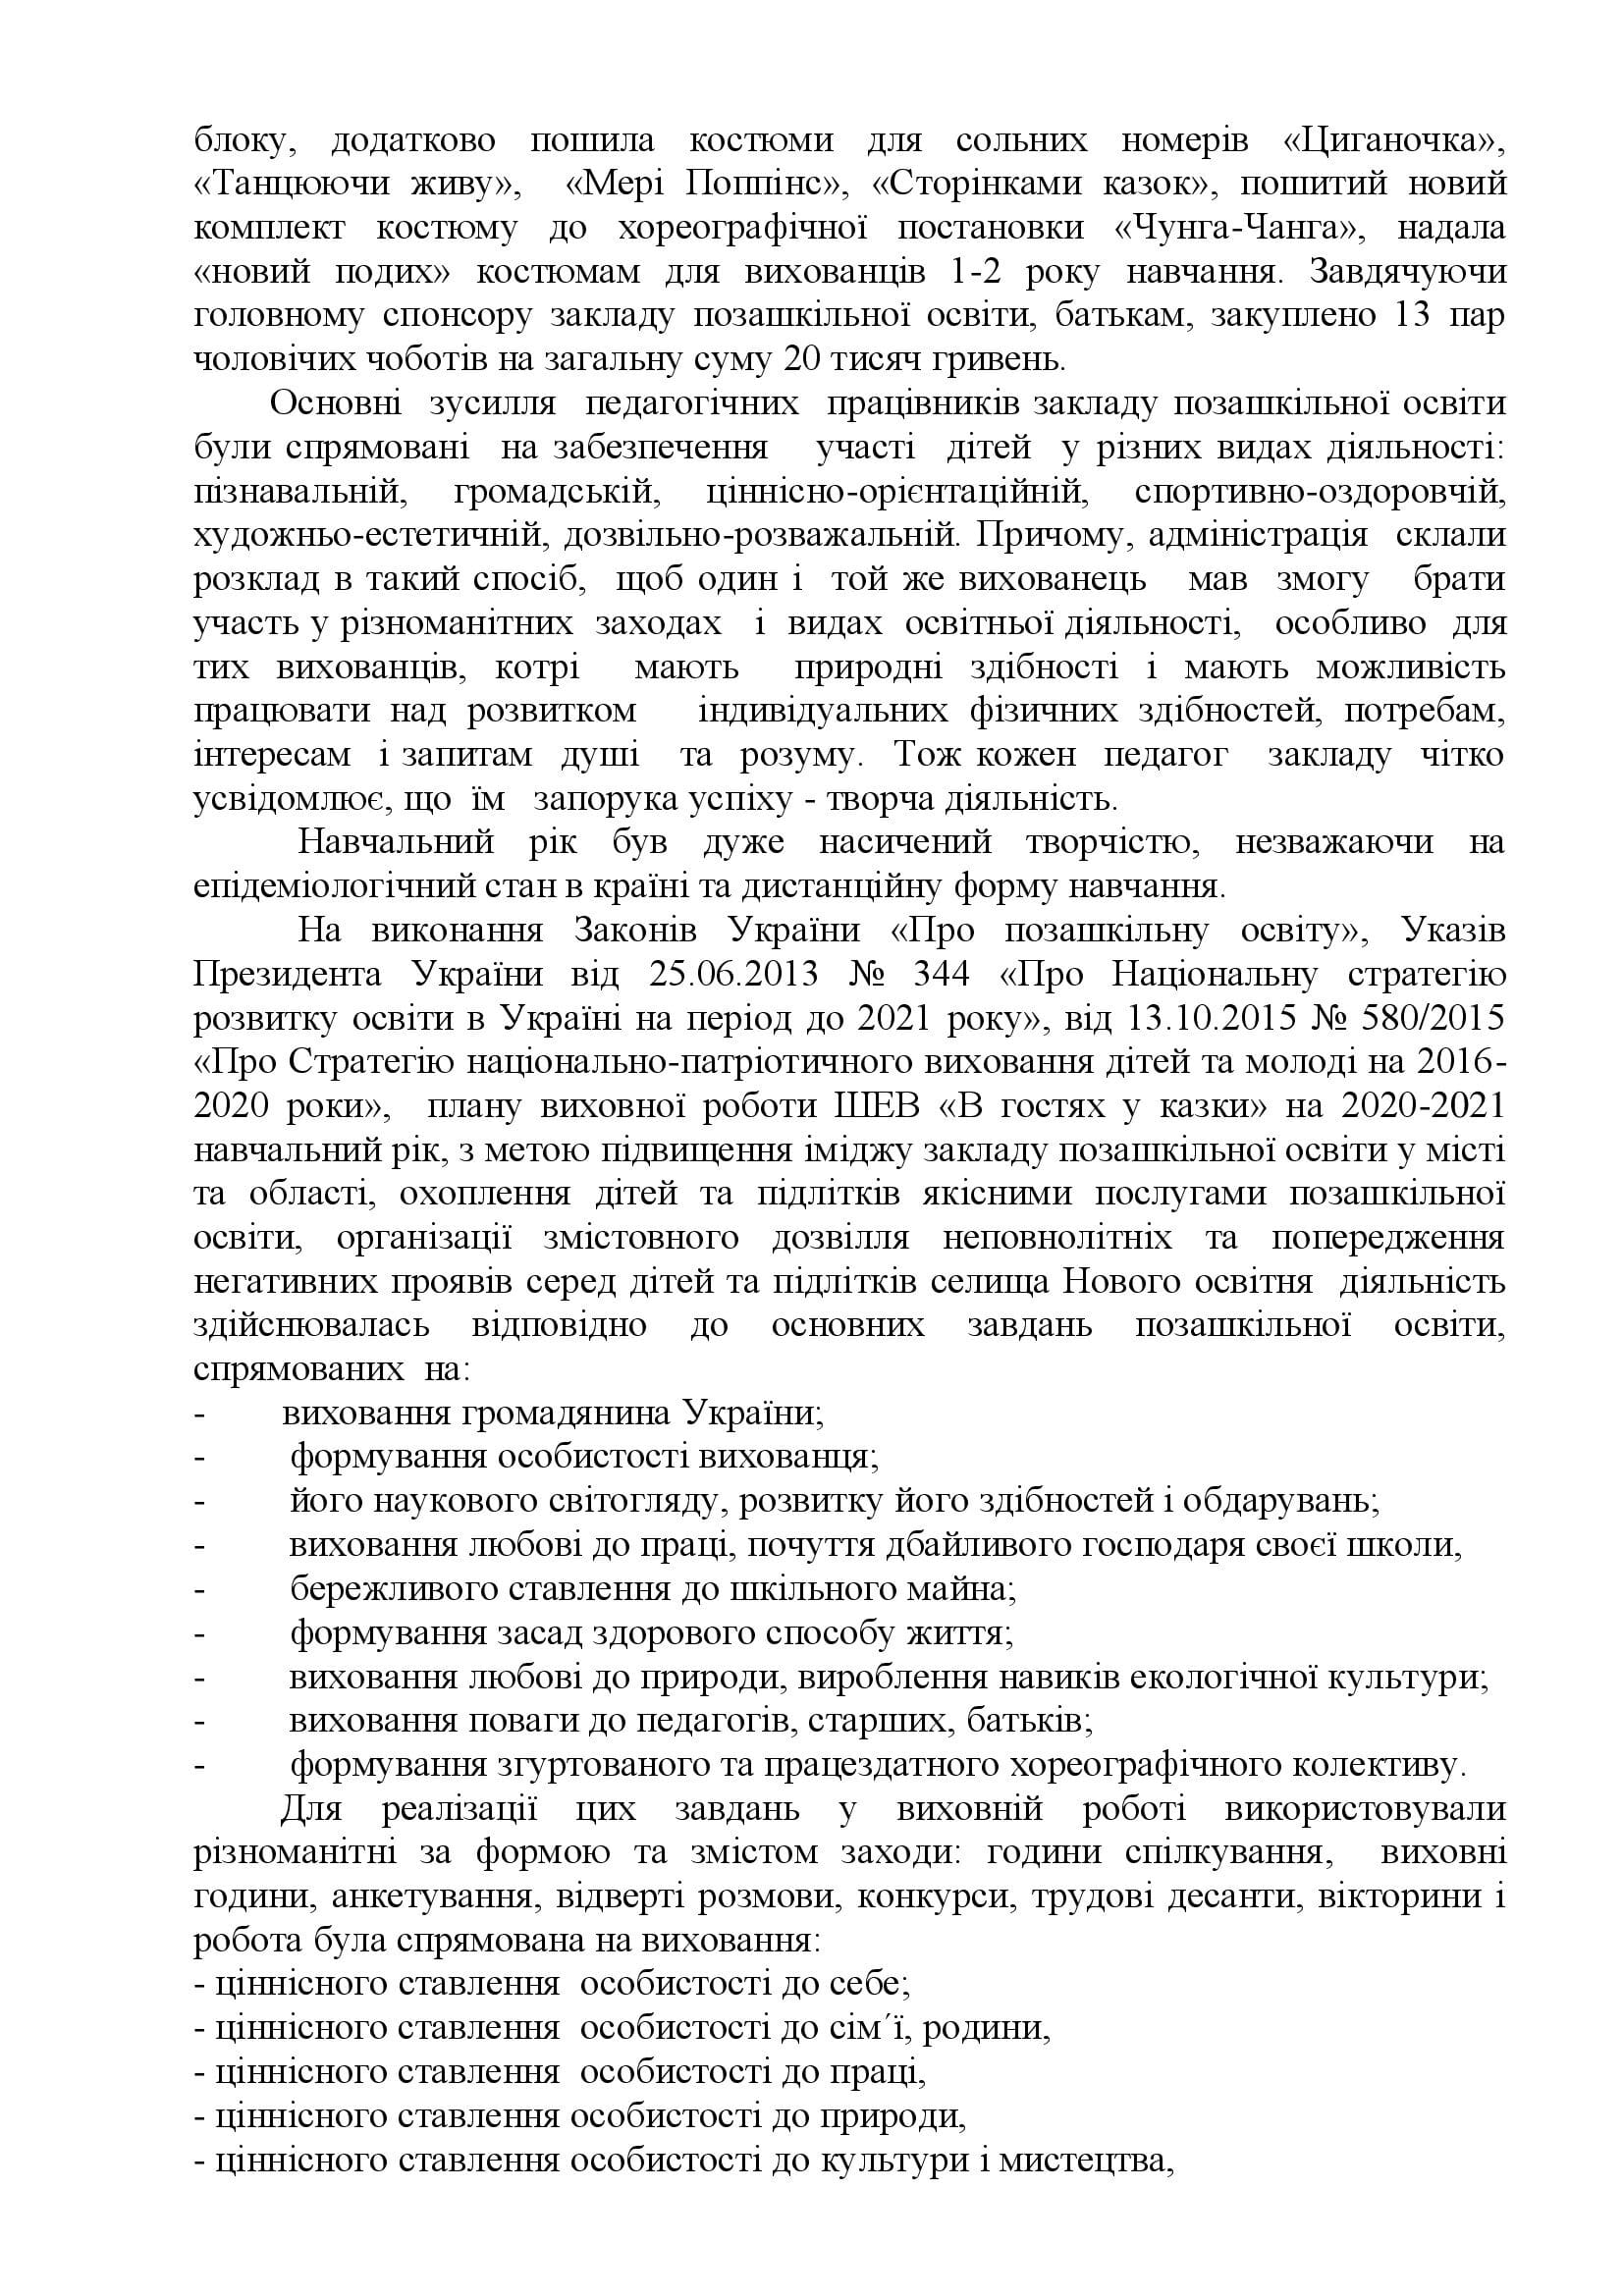 План роботи ШЕВ В гостях у казки  2021-2022_00007